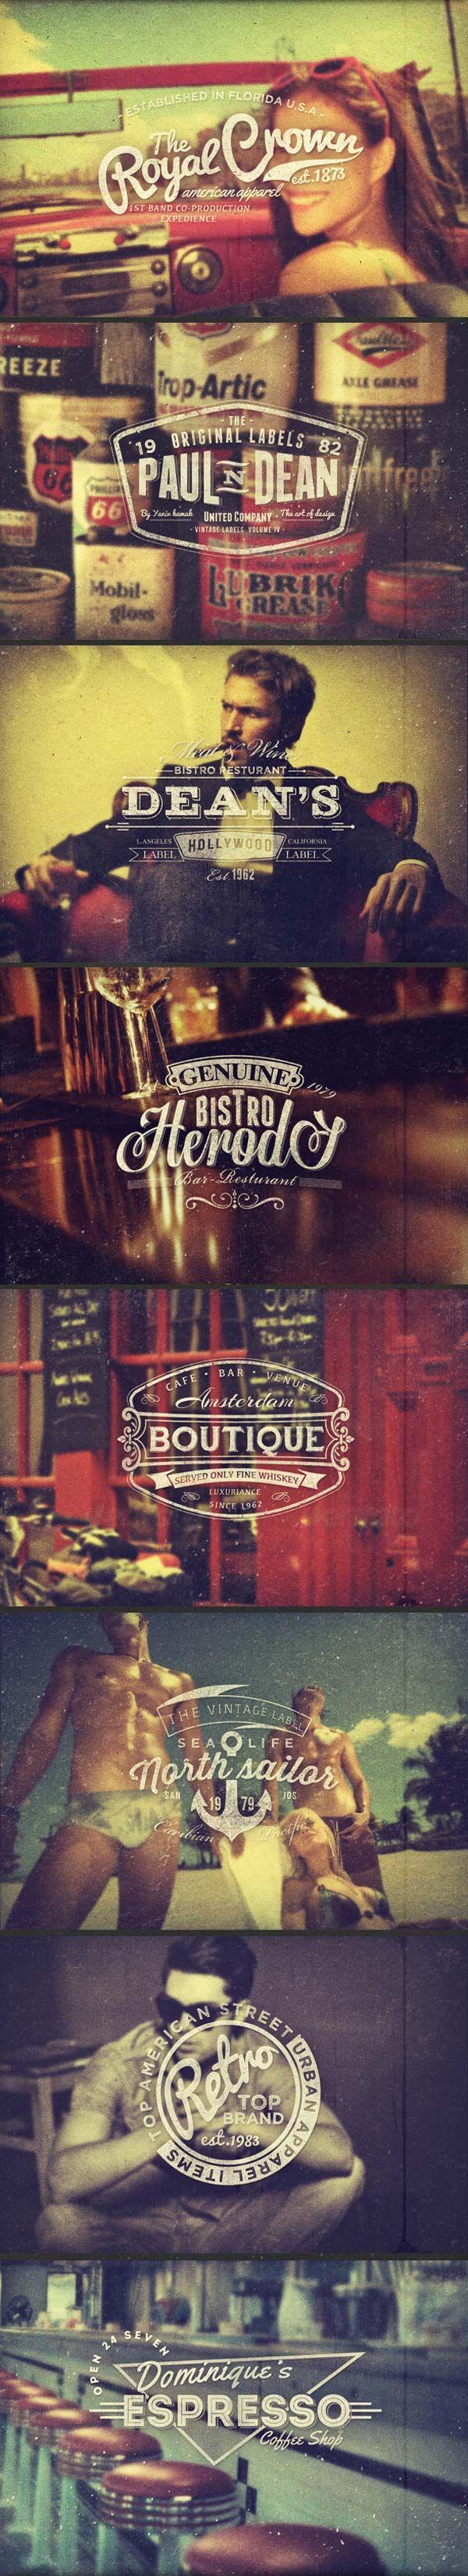 Vintage Labels Vol. 4 by Yaniv Kamak